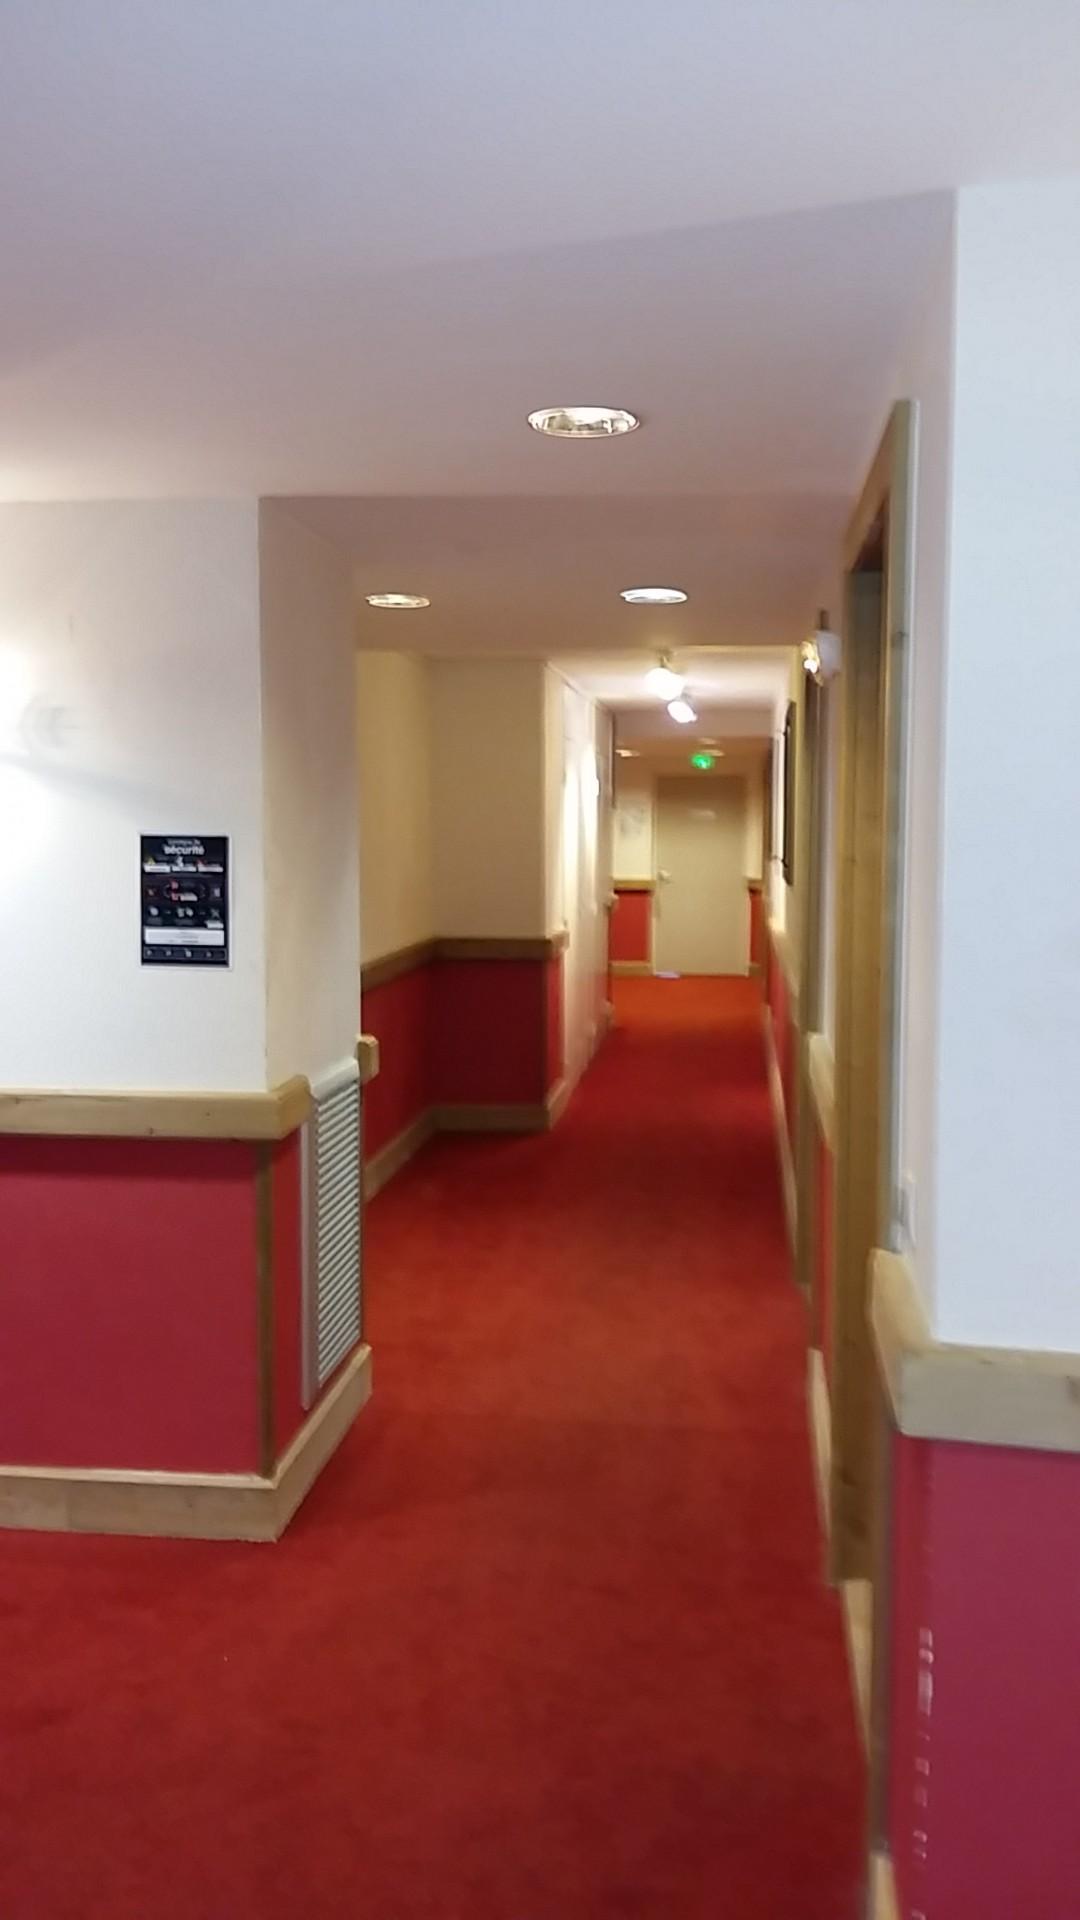 20180217-171307-couloir-4eme-etage-14505